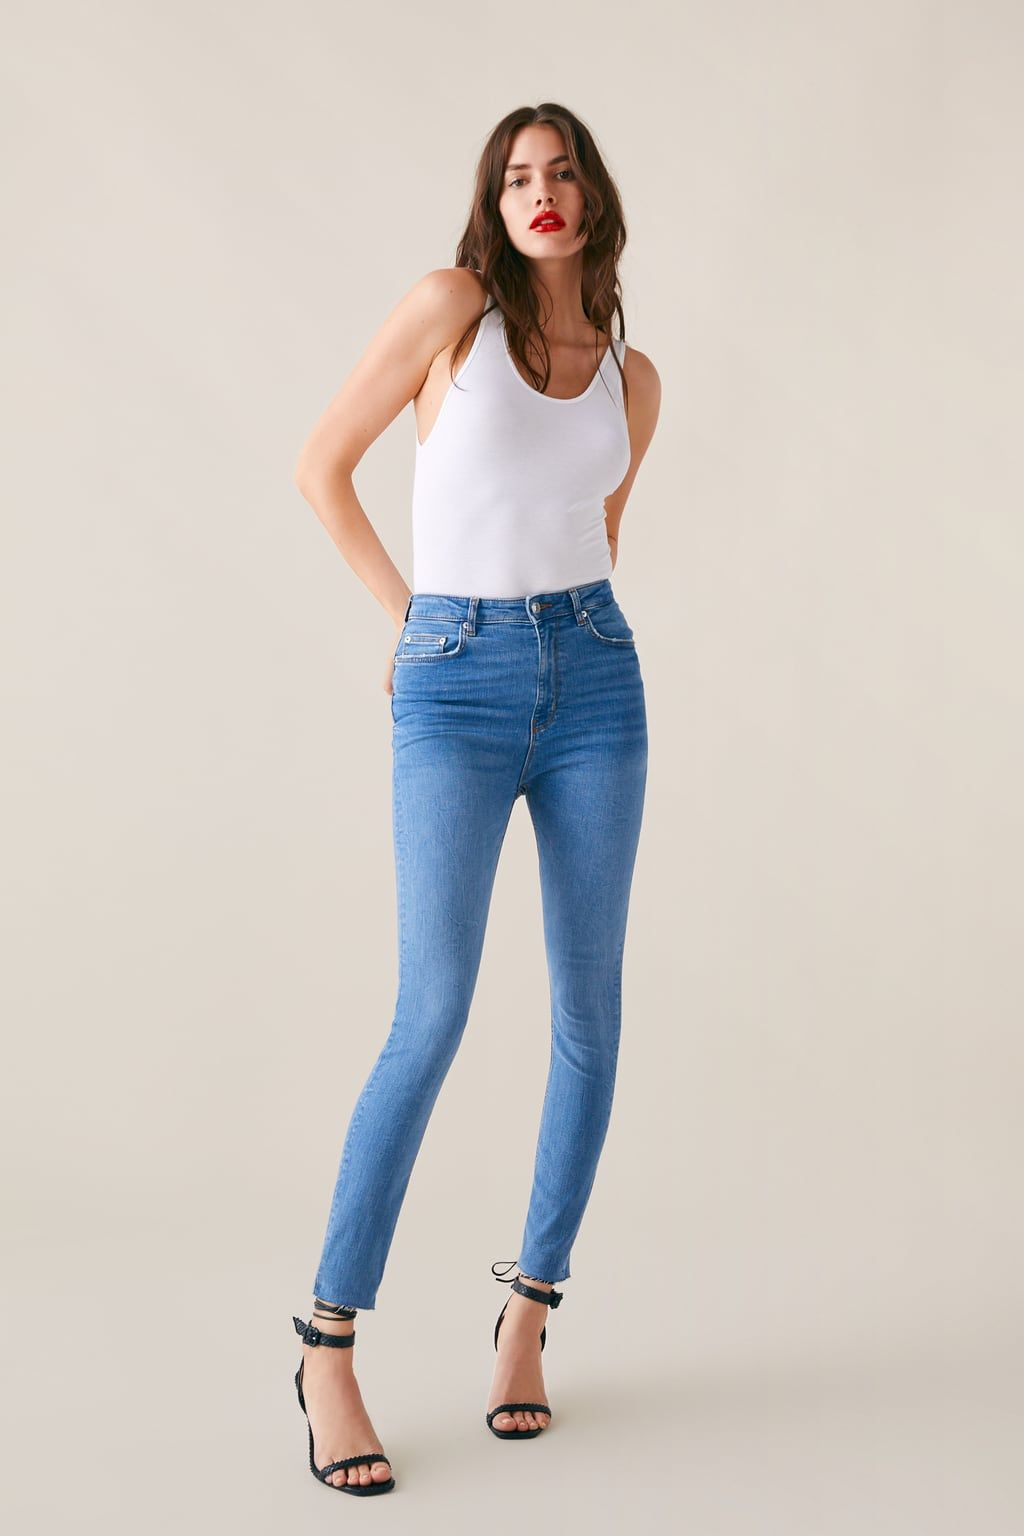 6a8794b529 Zw premium high waist skinny jeans in sunrise blue in 2019 | Items I ...